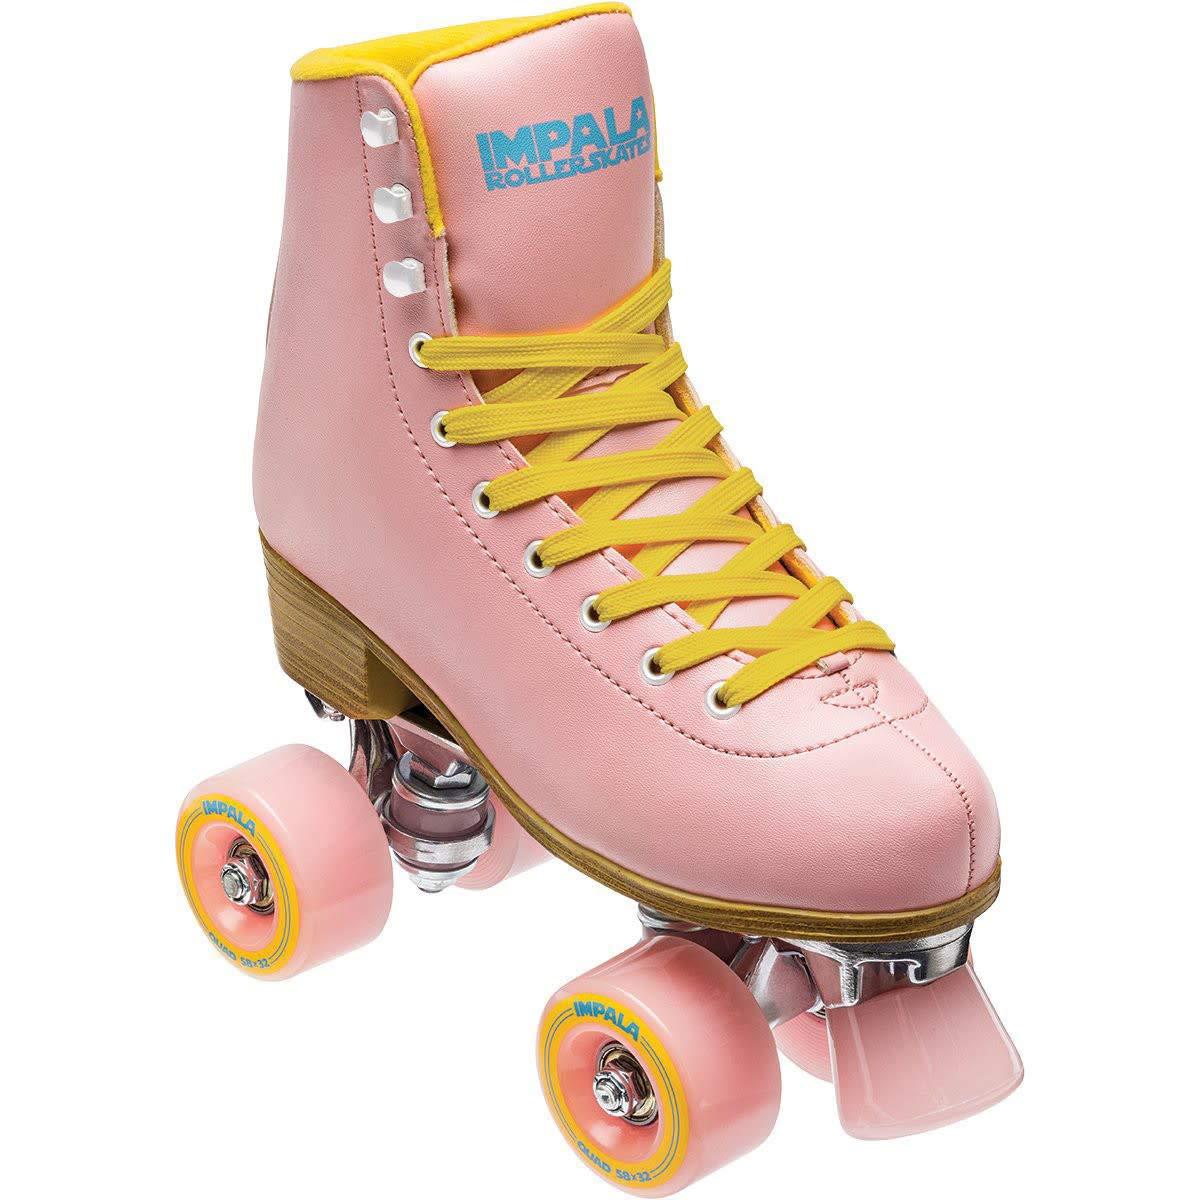 Impala Rollerskates Impala Quad Skate Skates, Women